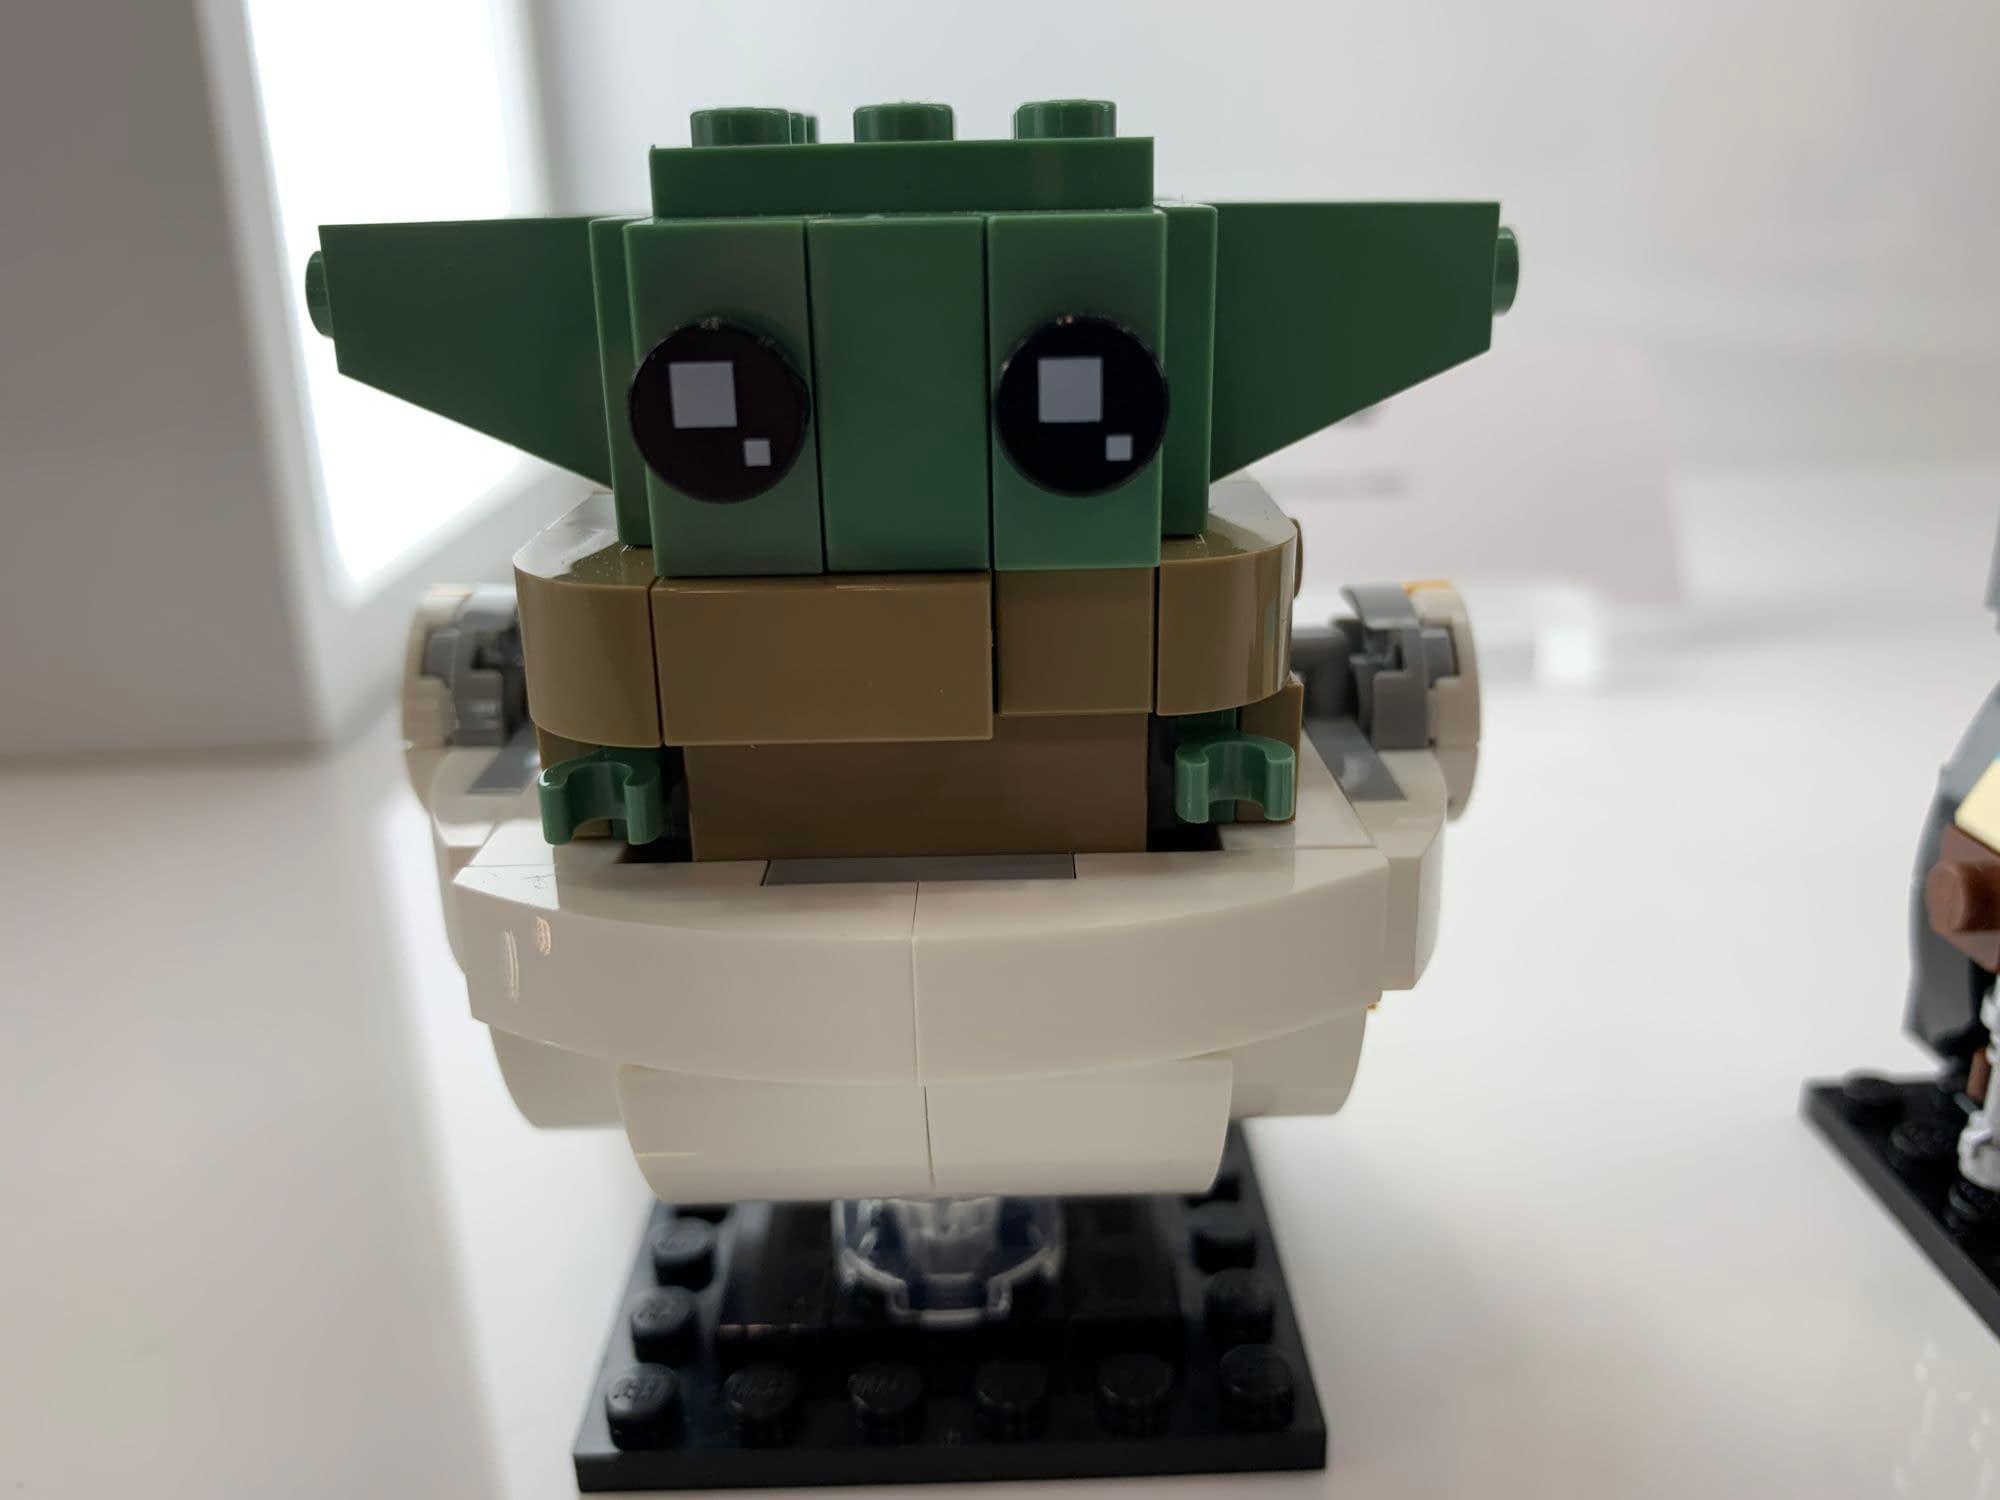 New York Toy Fair: 55 Photos from the LEGO Booth